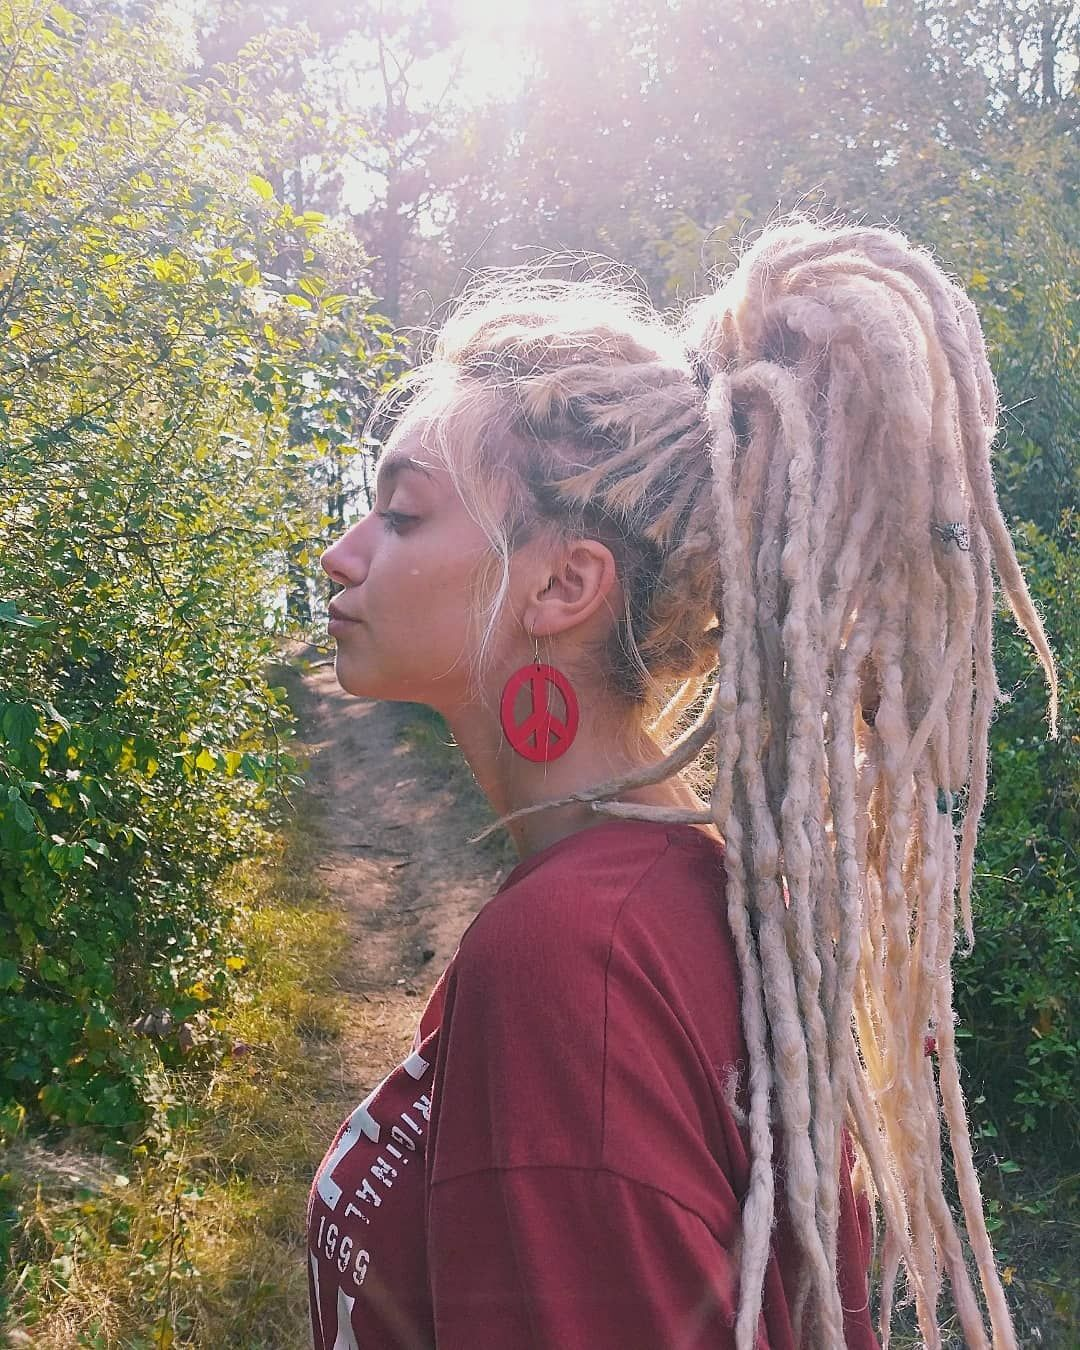 3 517 Curtidas 28 Comentarios Jefimija Stefanovic Jefiimijaa No Instagram Dreadlocks Girl Blonde Dreads White Girl Dreads